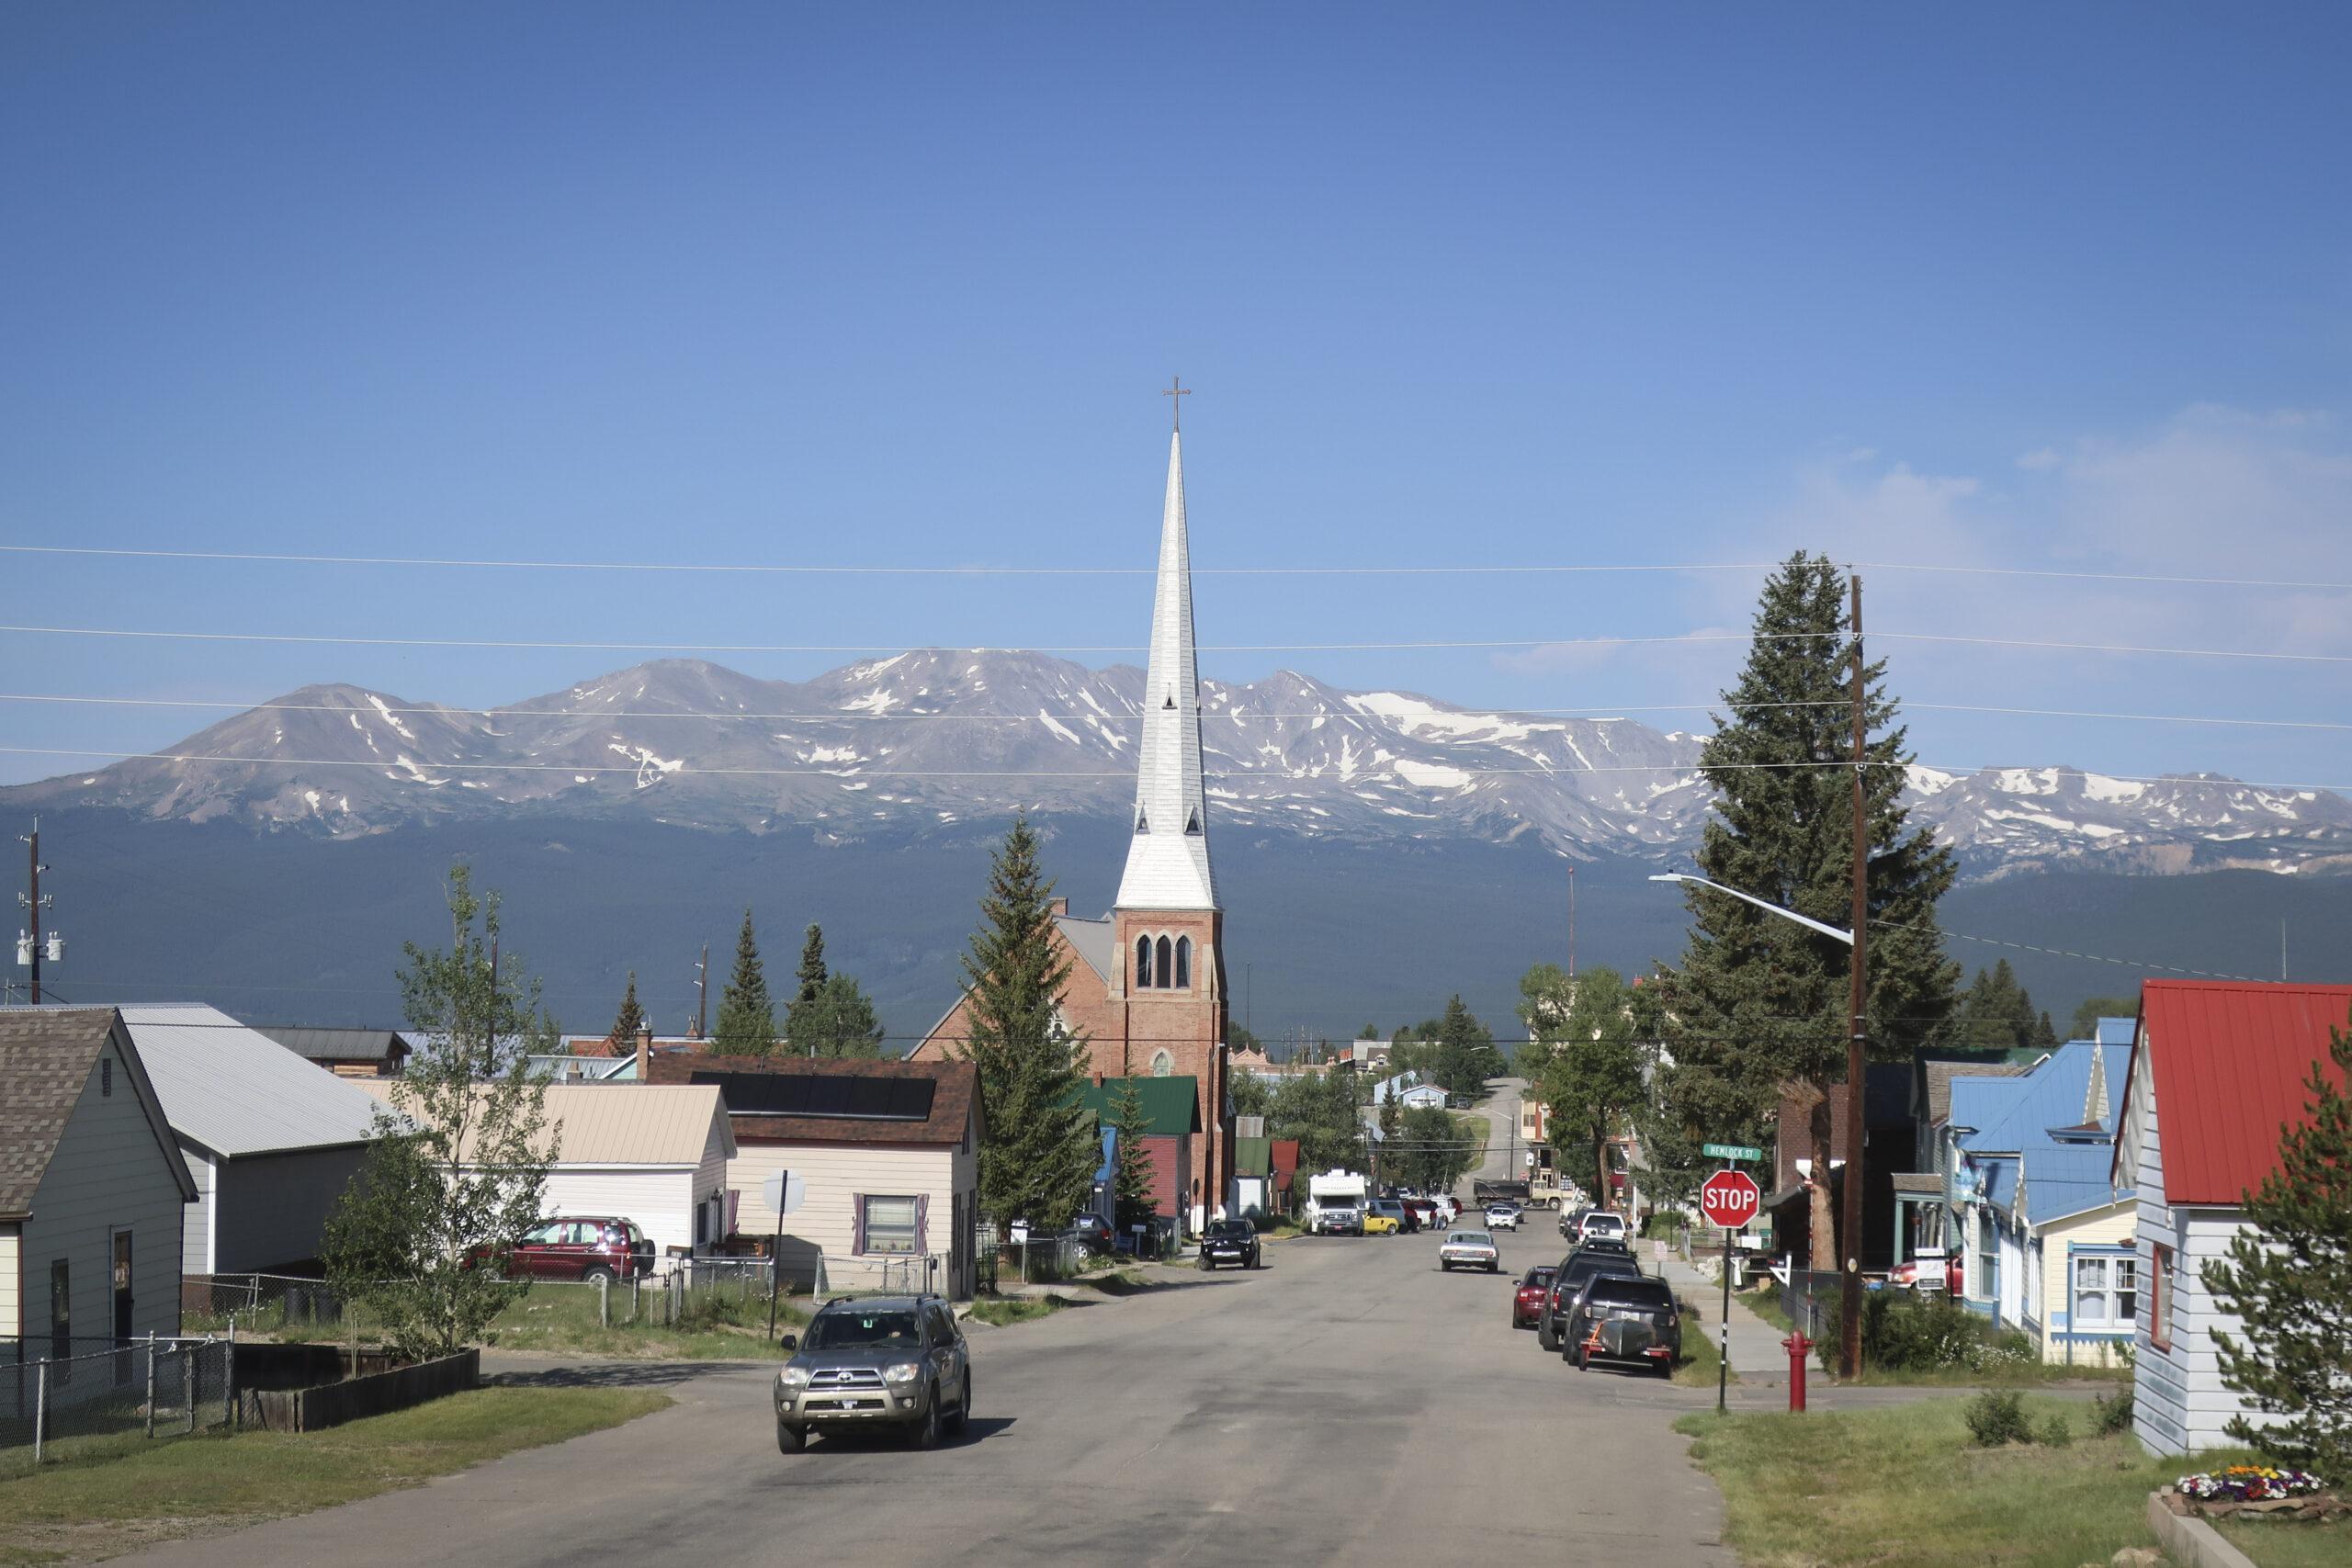 Leadville, Colorado on Thursday, July 16, 2020.